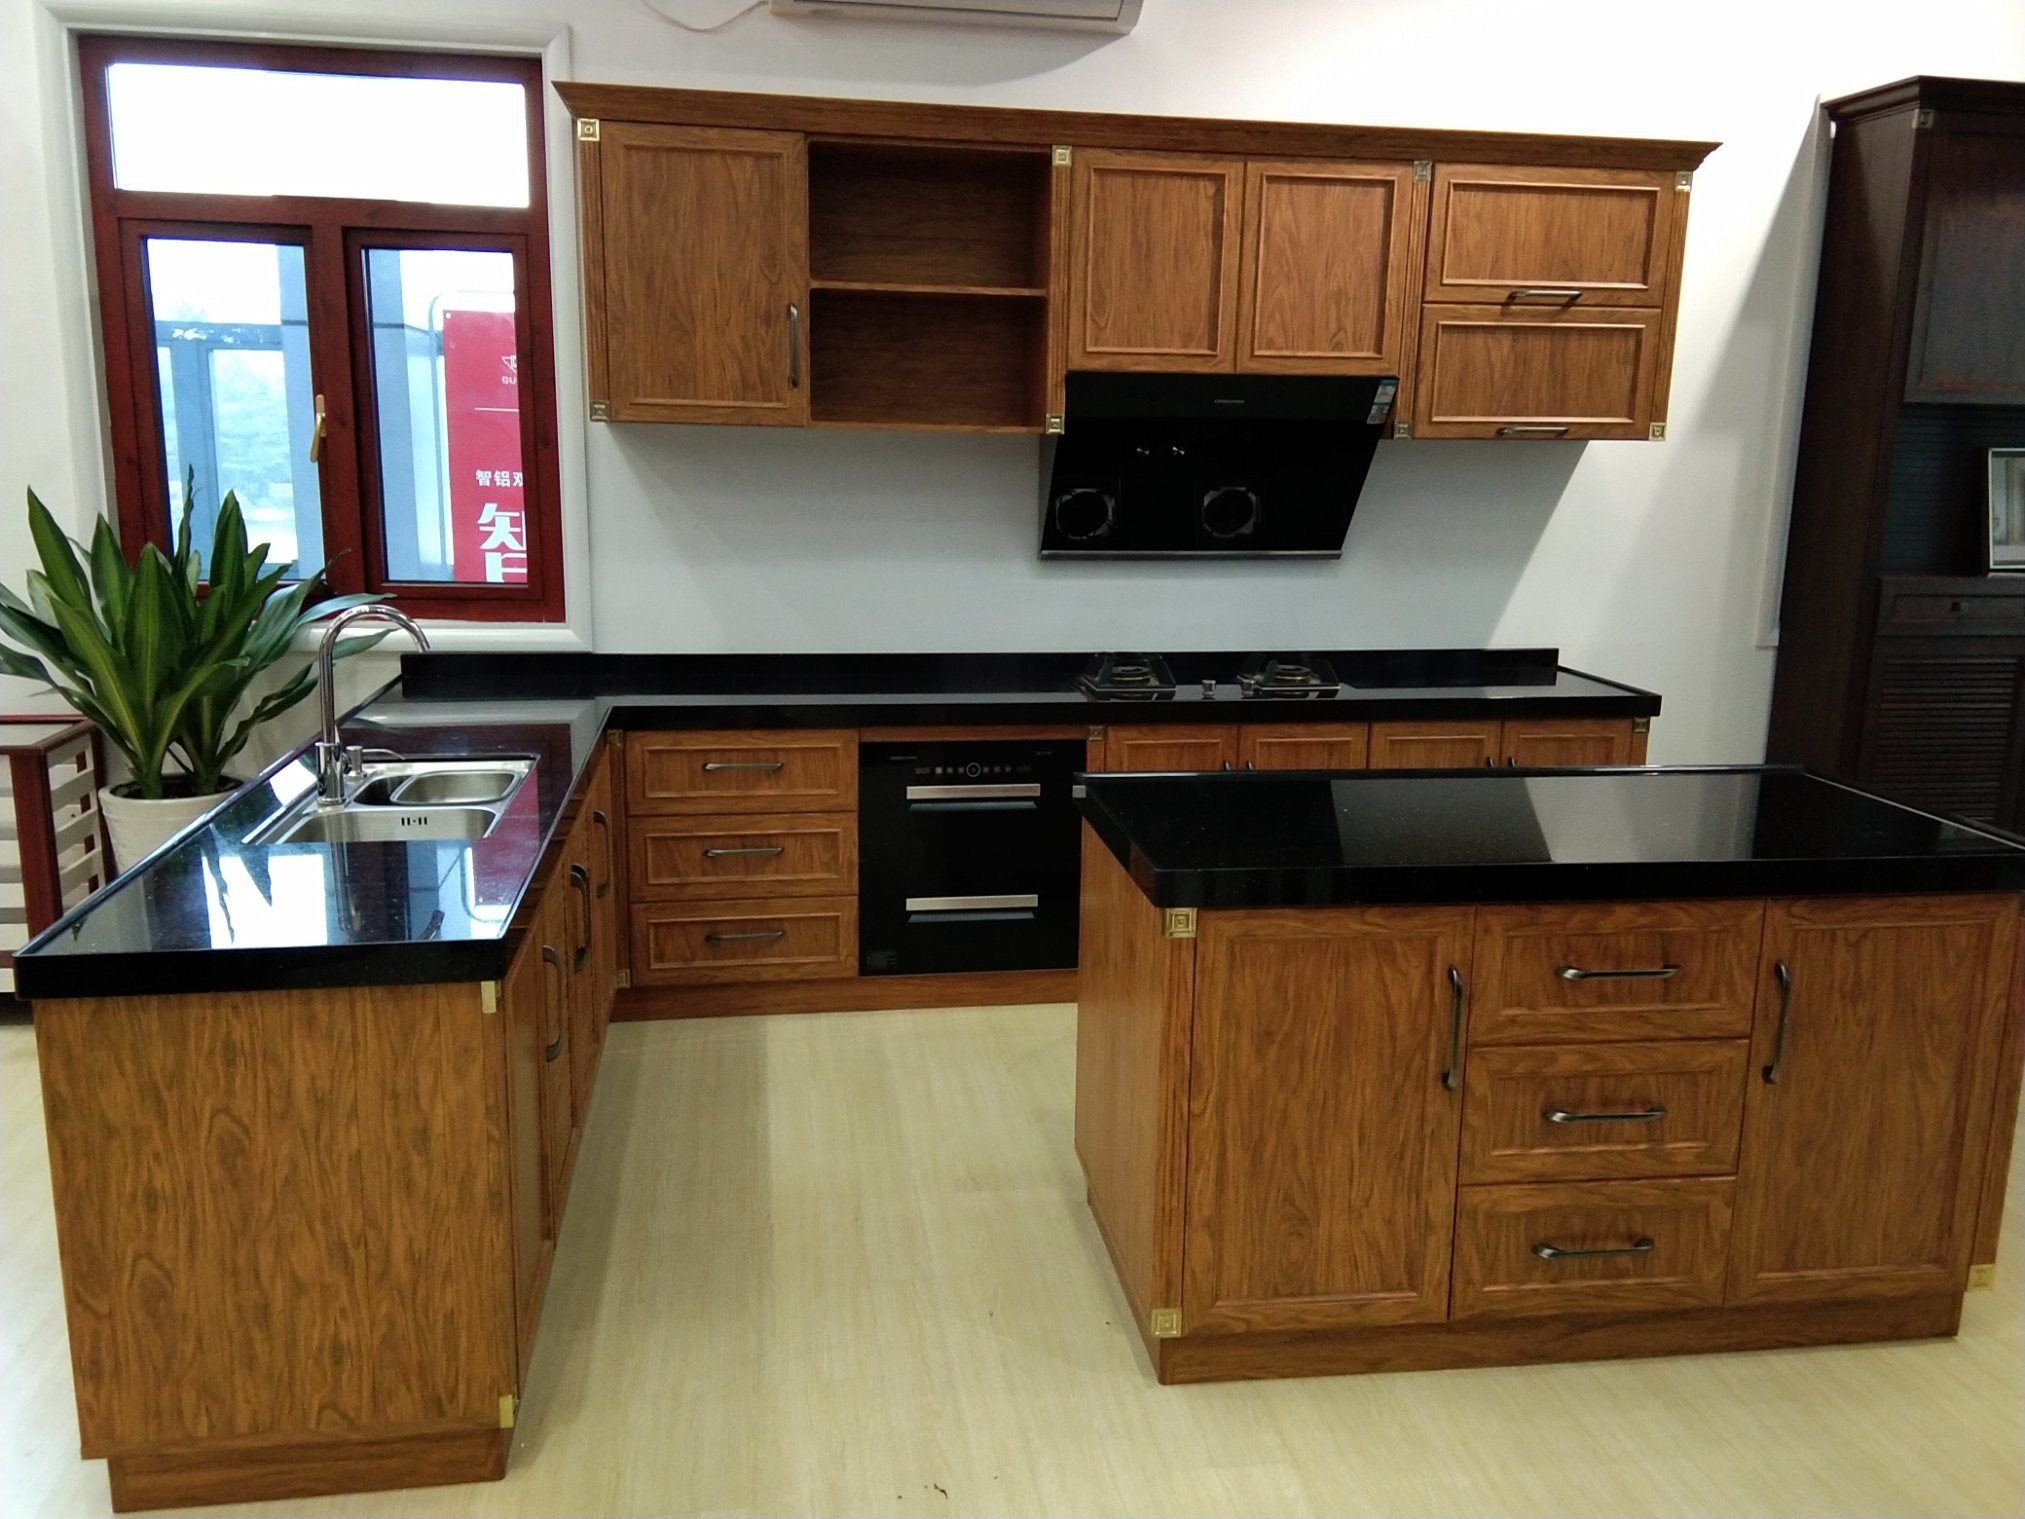 China Aluminium Kitchen Cabinet Designs Modern Kitchen Cupboard China Kitchen Cabinet Lacquer Kitchen Cabinet